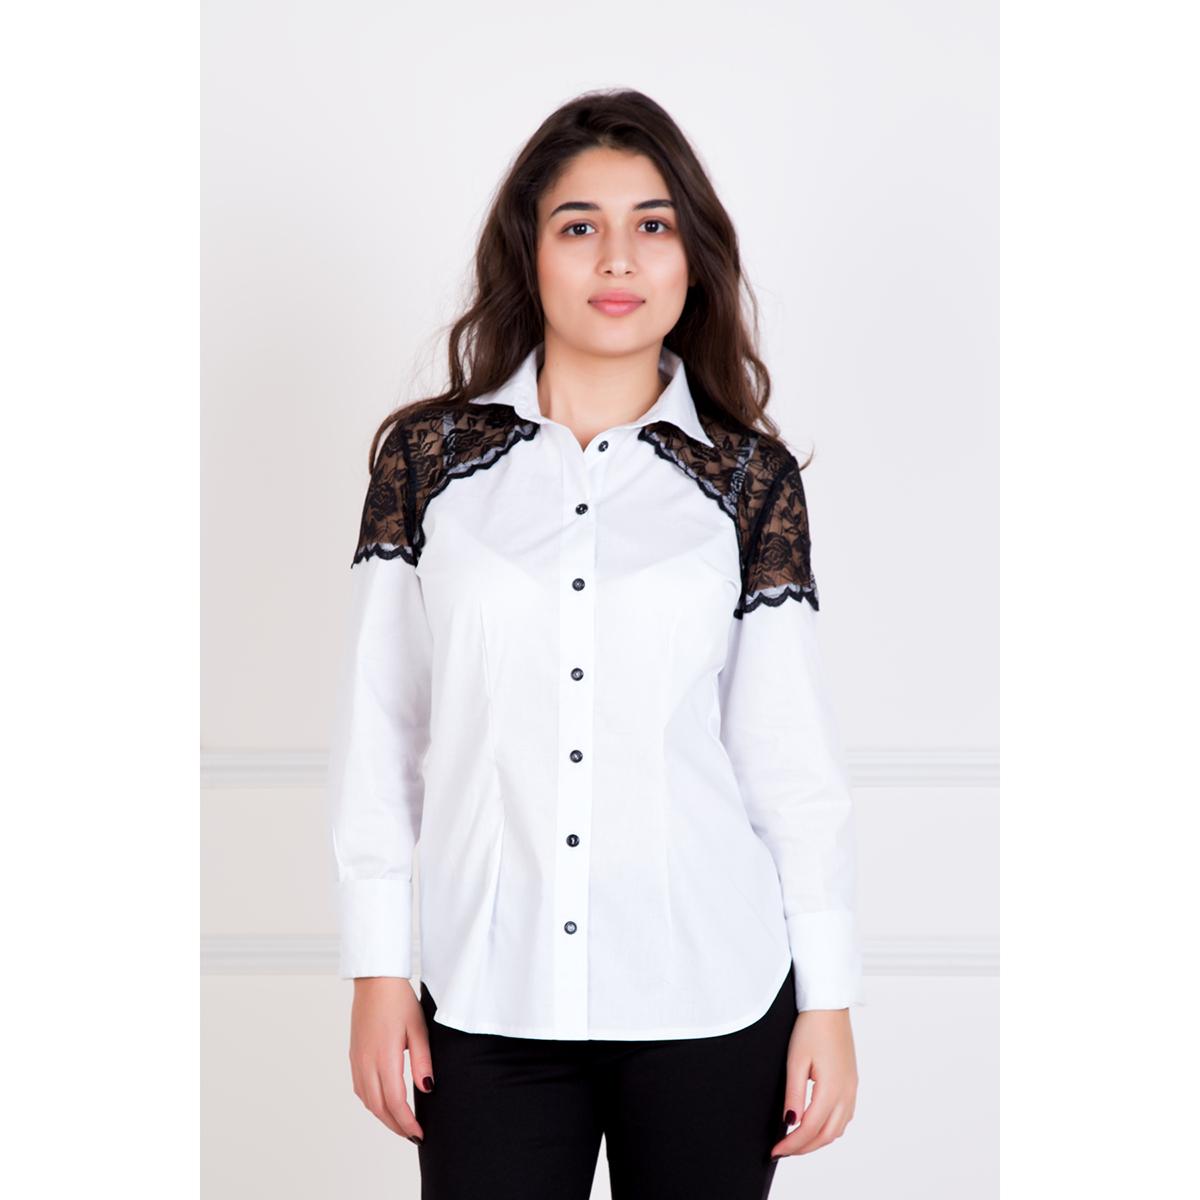 Женская рубашка Инь, размер 50Рубашки<br>Обхват груди:100 см<br>Обхват талии:82 см<br>Обхват бедер:108 см<br>Рост:167 см<br><br>Тип: Жен. рубашка<br>Размер: 50<br>Материал: Хлопок